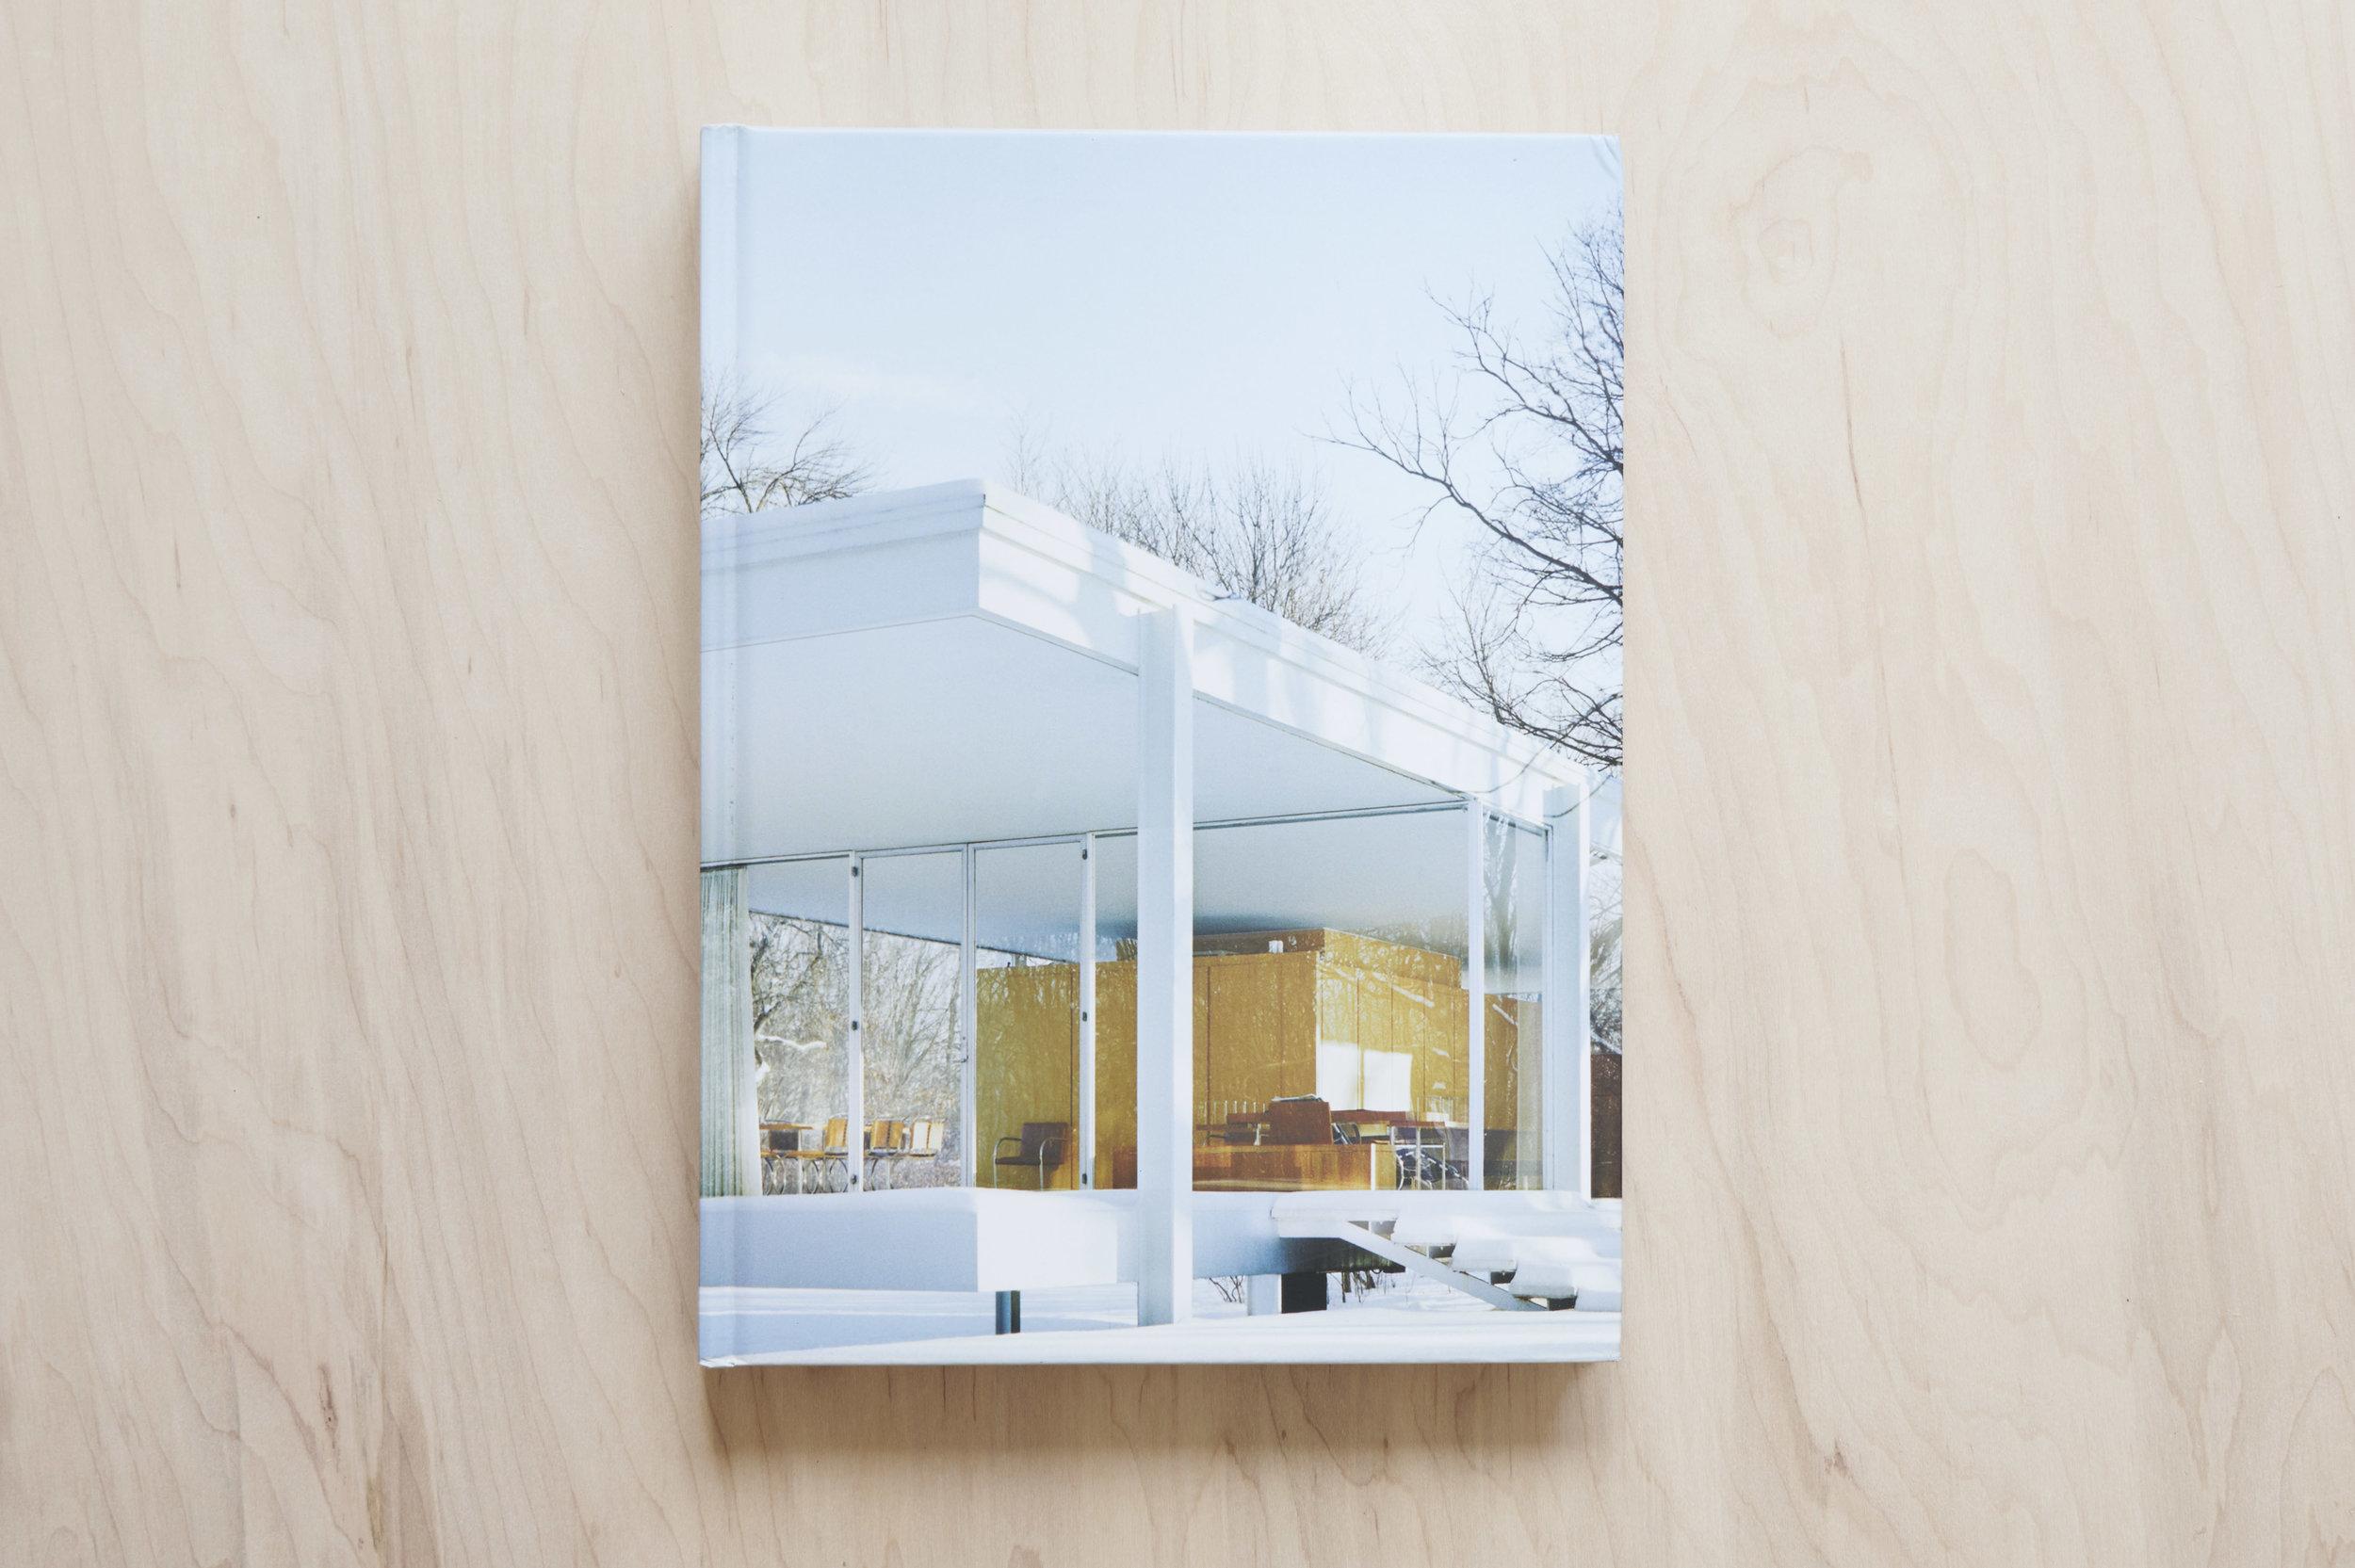 2019_03_04_bookproject_0389.jpg